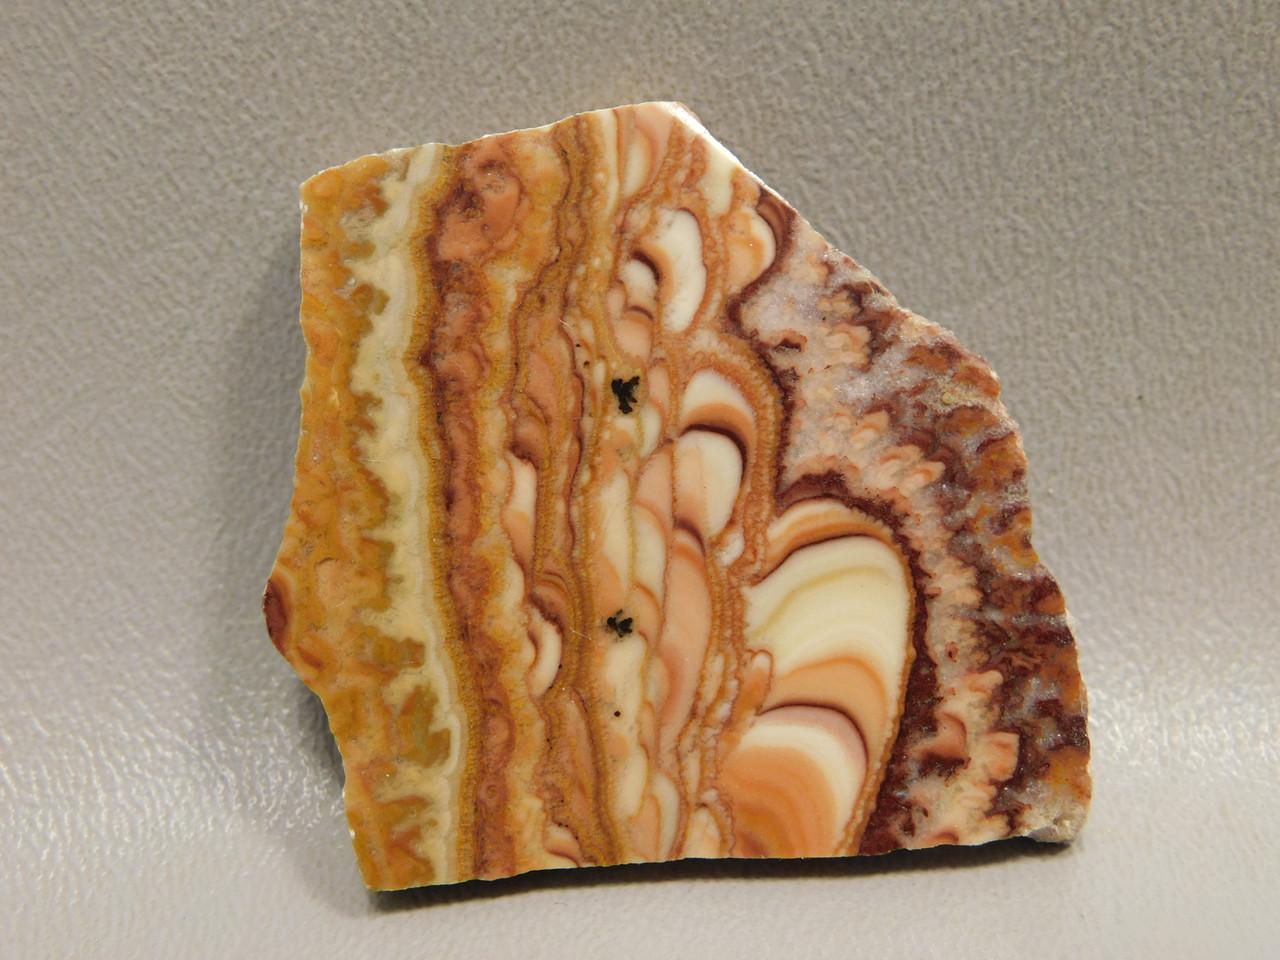 Wavy Dolomite Cabochon Small Polished Stone Slab #S1